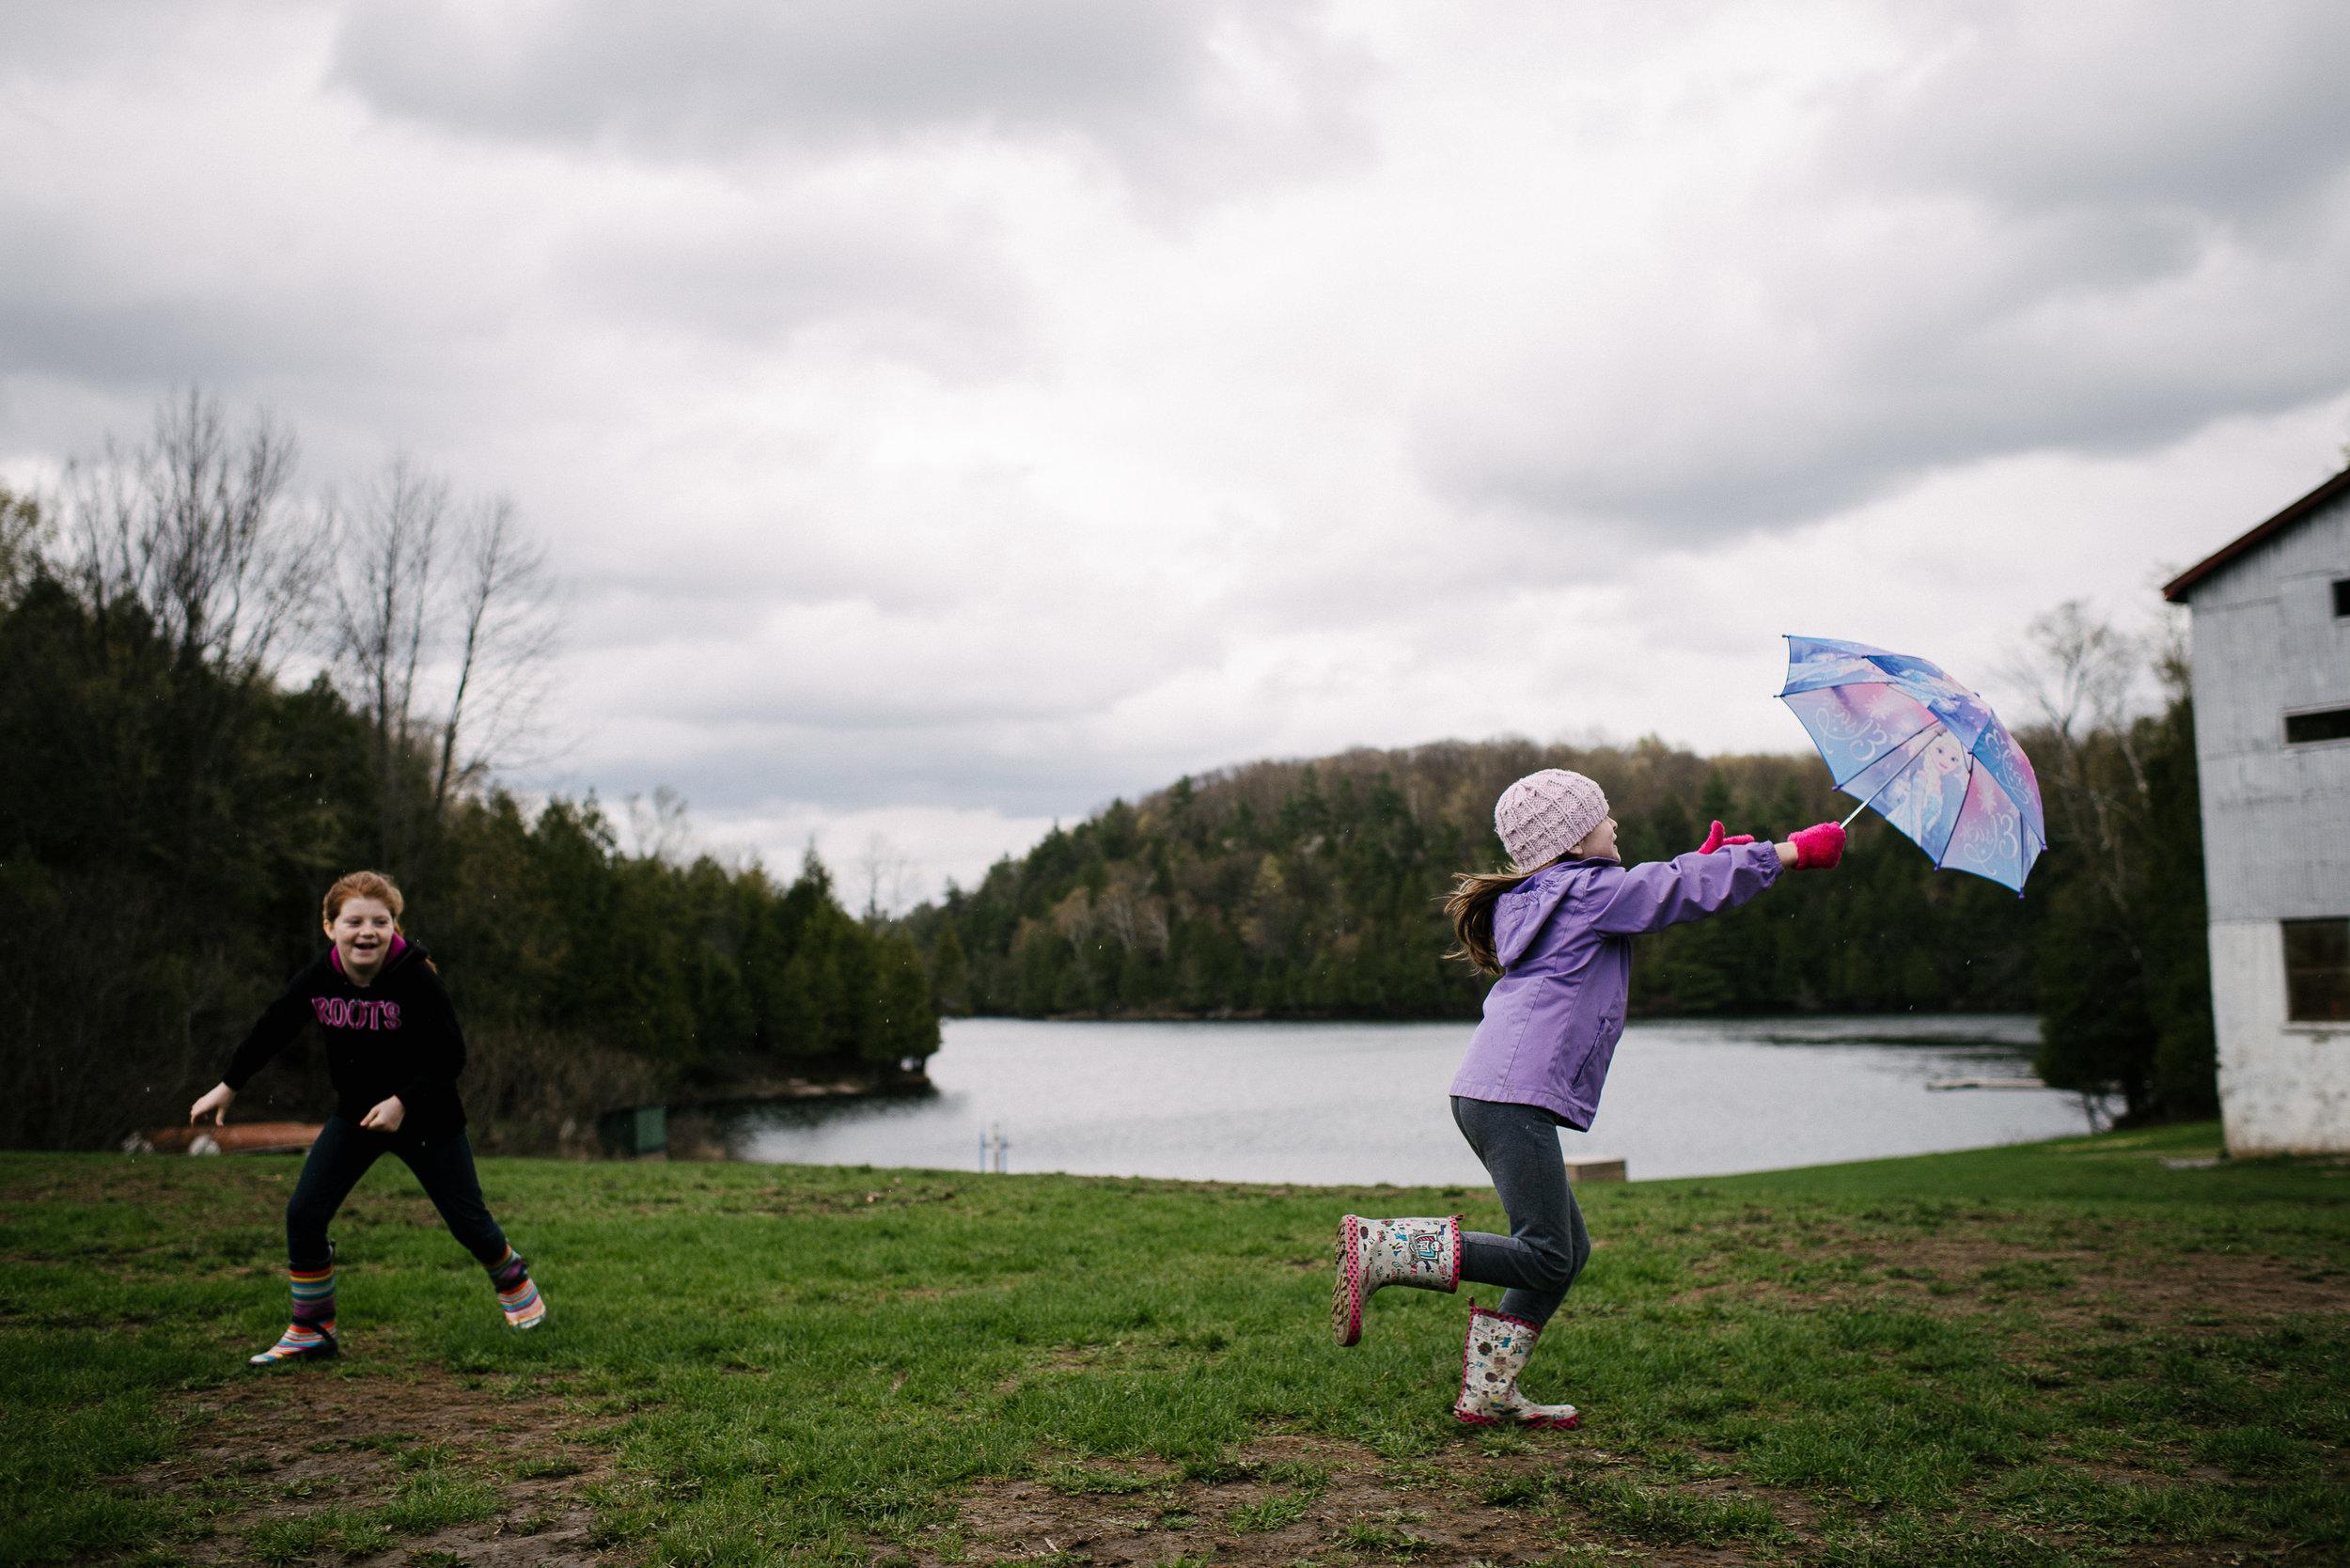 documentary school photography viara mileva kingston toronto ottawa-123443vm.jpg